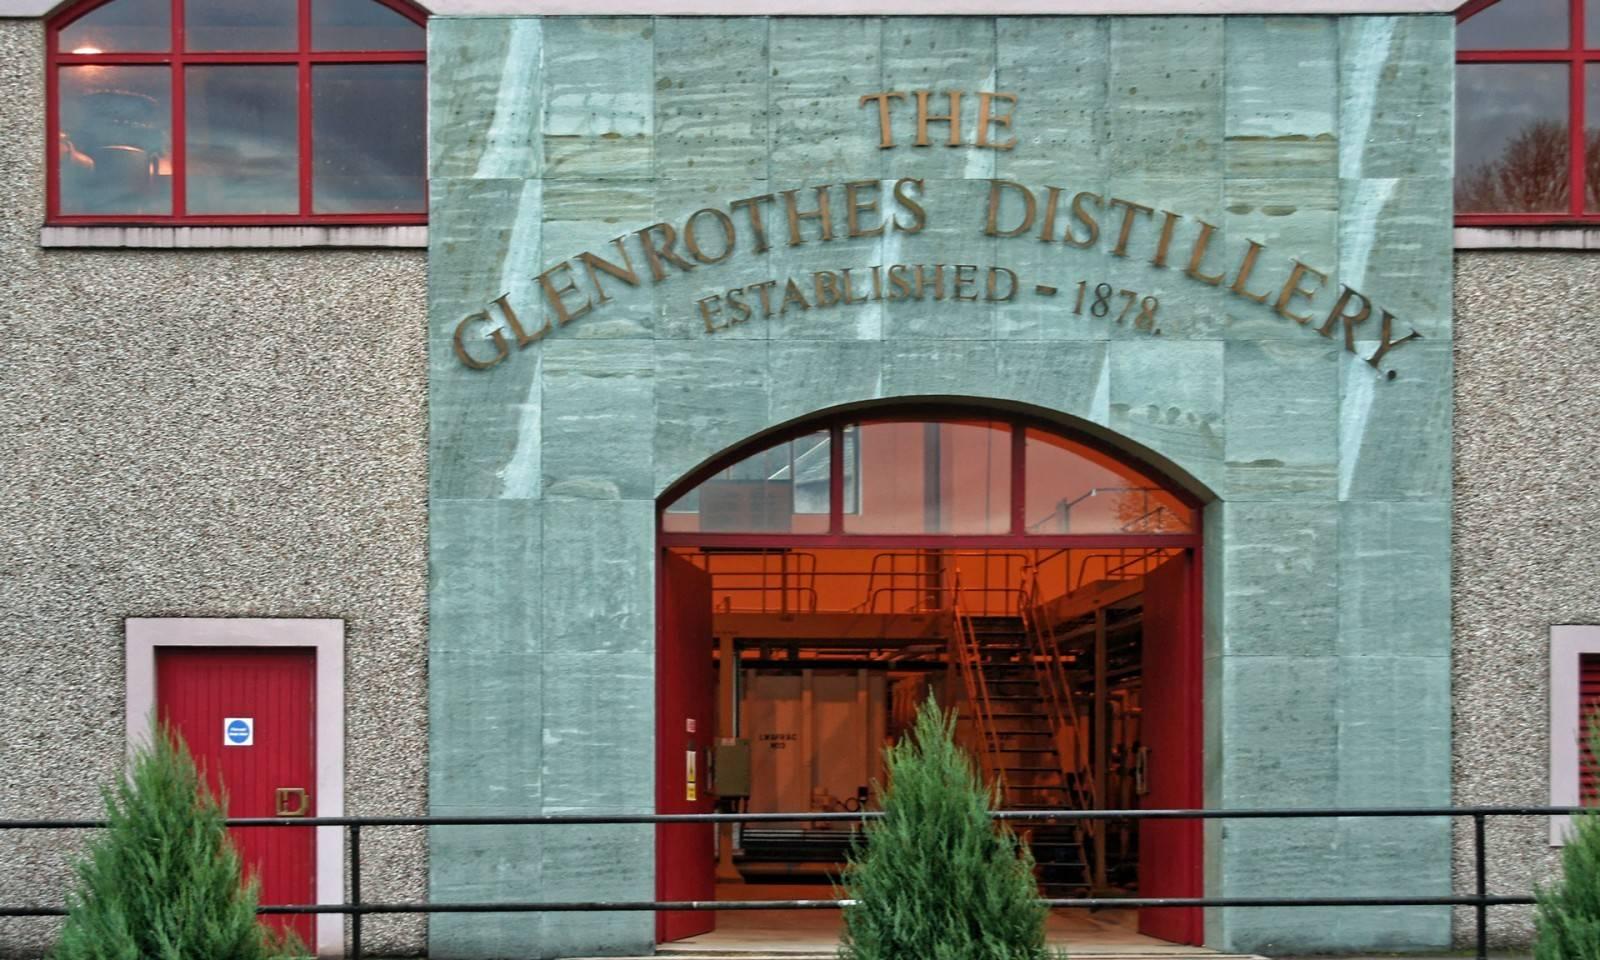 Glenrothes Stillhouse Eingang